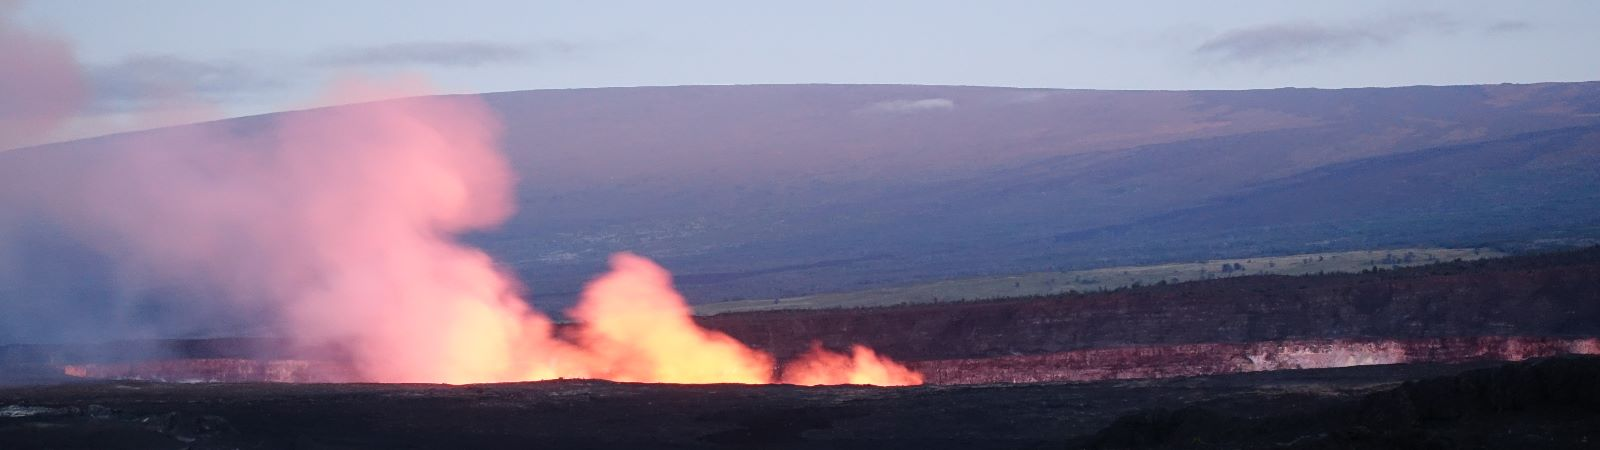 afrika vulkane gefährten afrika